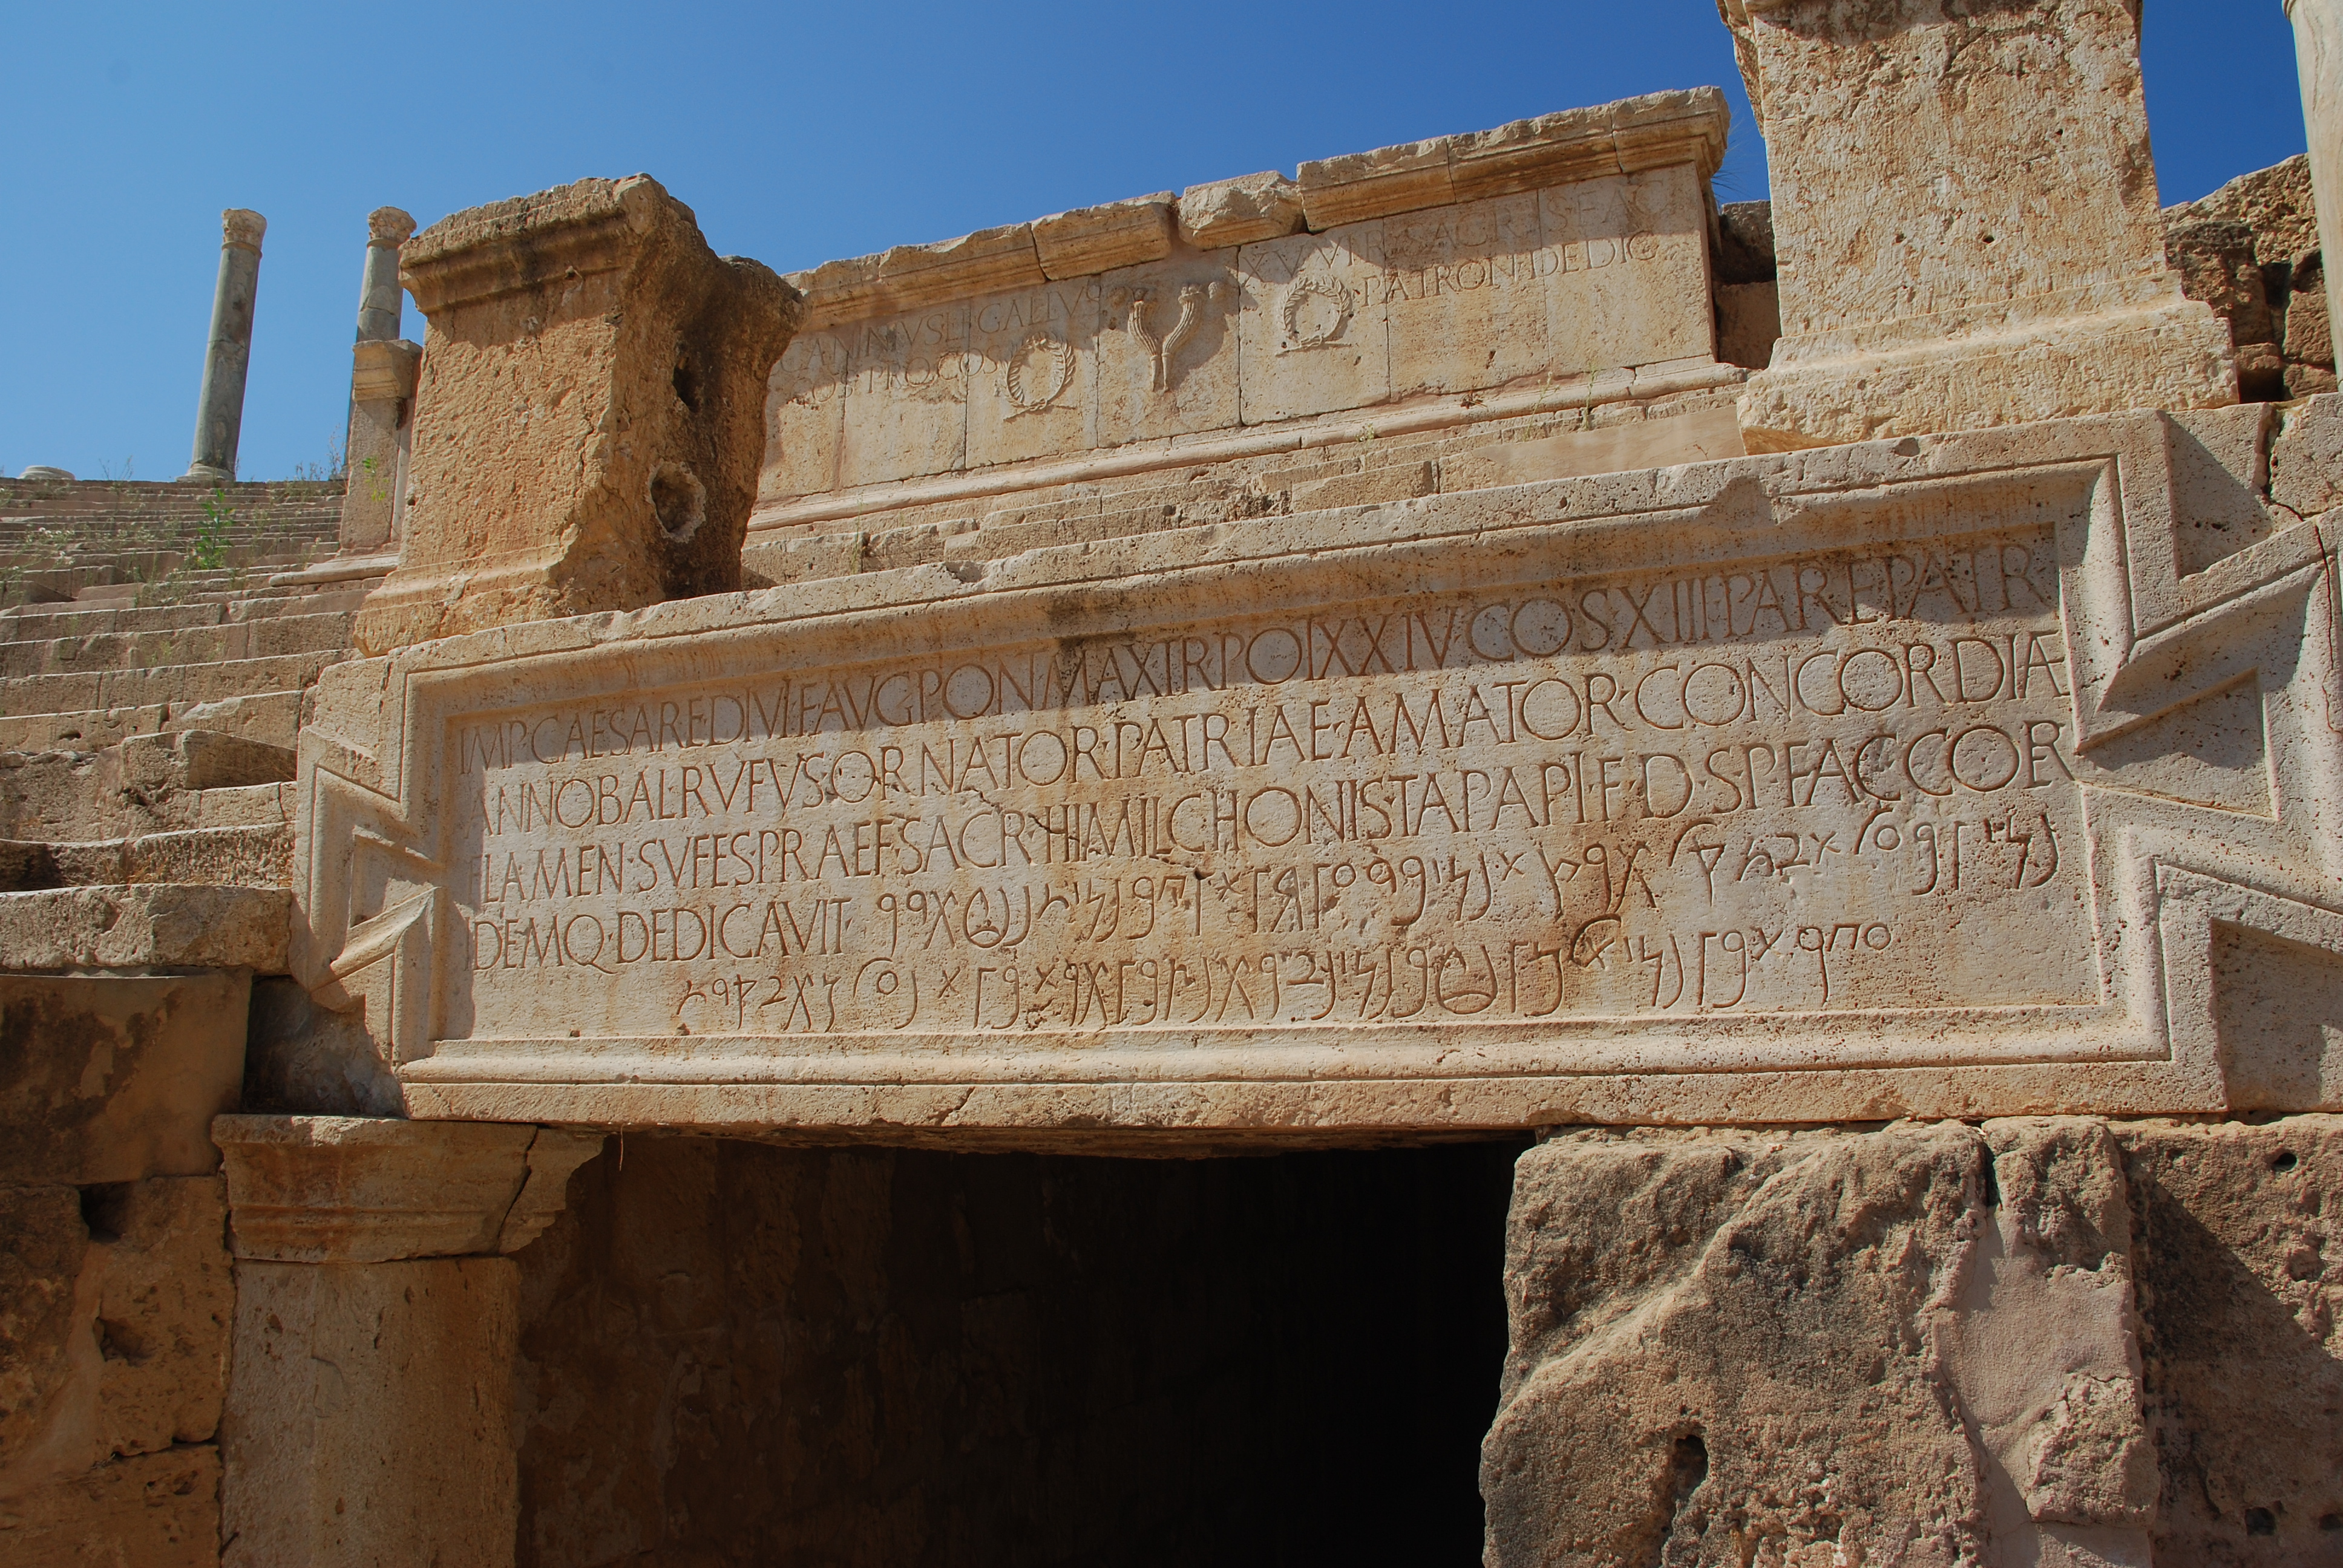 Inscription Theatre Leptis Magna Libya. By Papageizichta. https://upload.wikimedia.org/wikipedia/commons/2/2c/Inscription_Theatre_Leptis_Magna_Libya.JPG